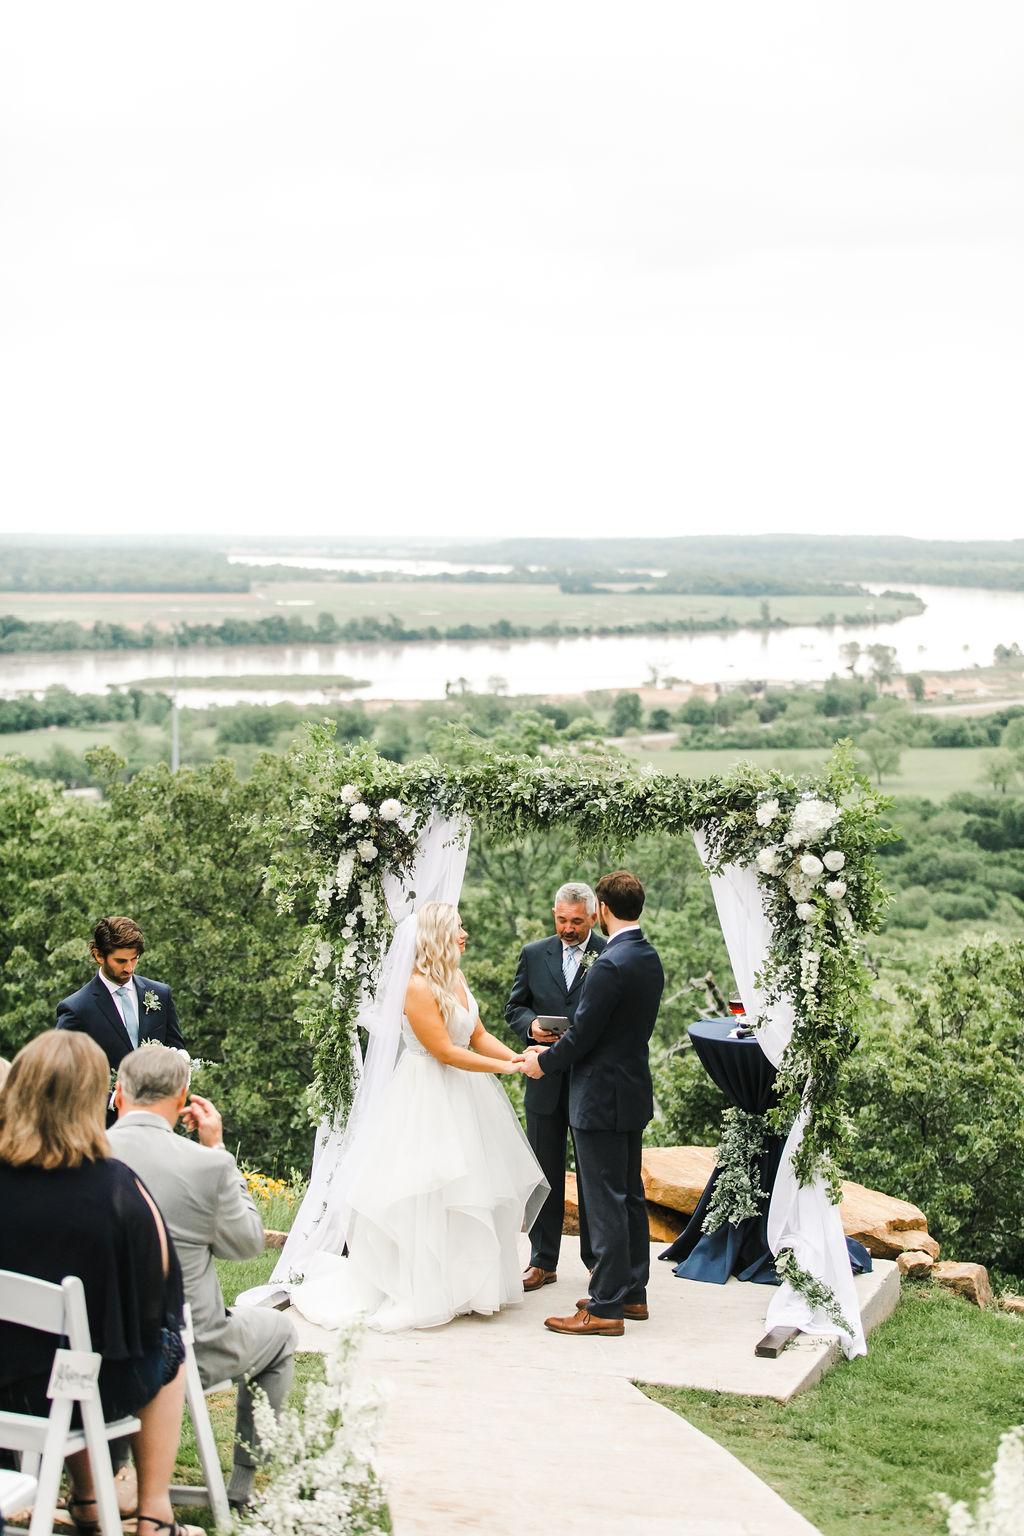 Dream Point Ranch Tulsa's White Barn Wedding Venue 75.jpg